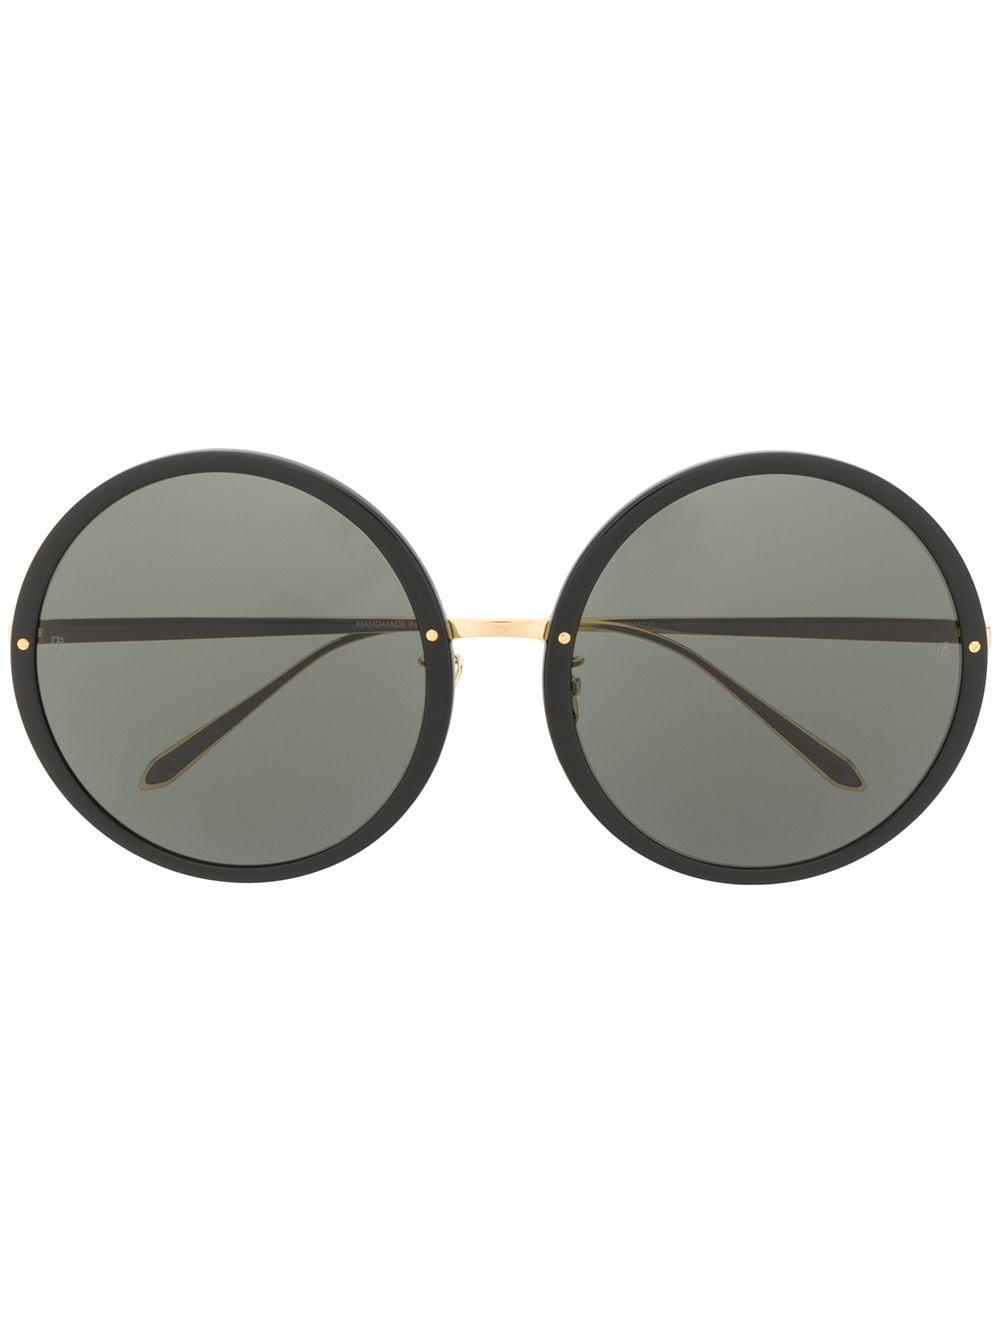 Linda Farrow Runde Oversized-Sonnenbrille - Schwarz